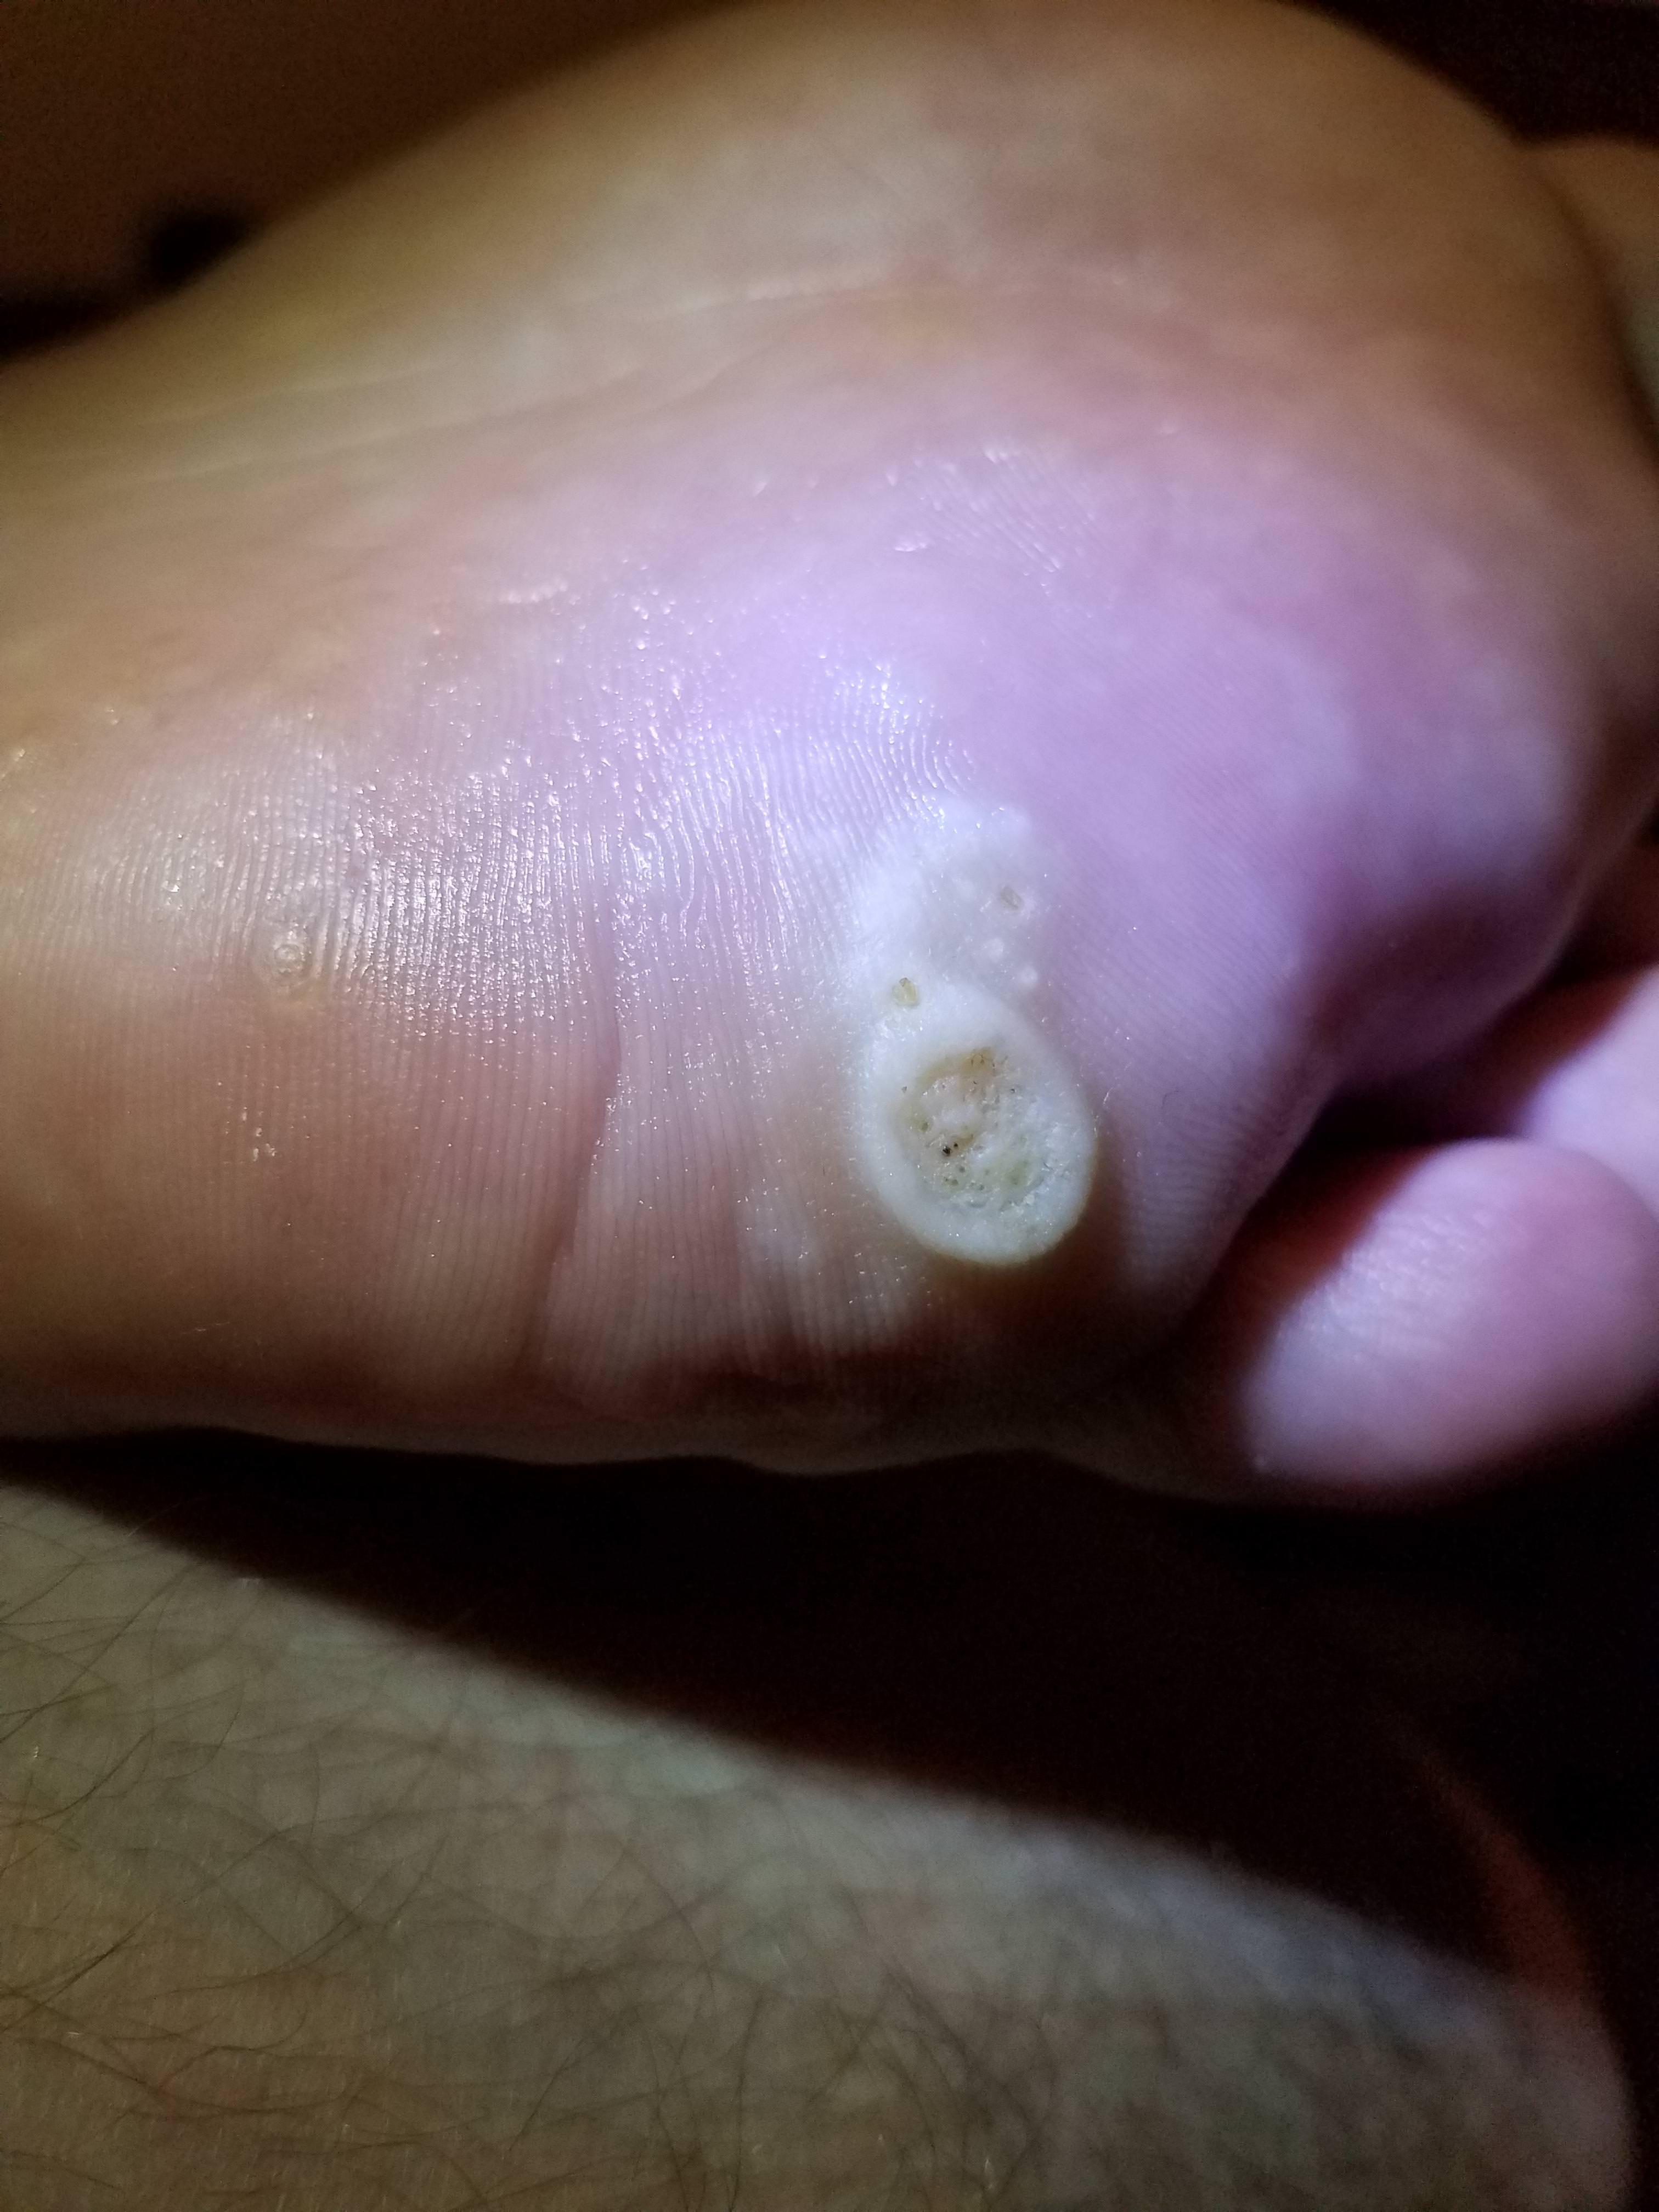 Verruca foot soak. Wart on foot salicylic acid